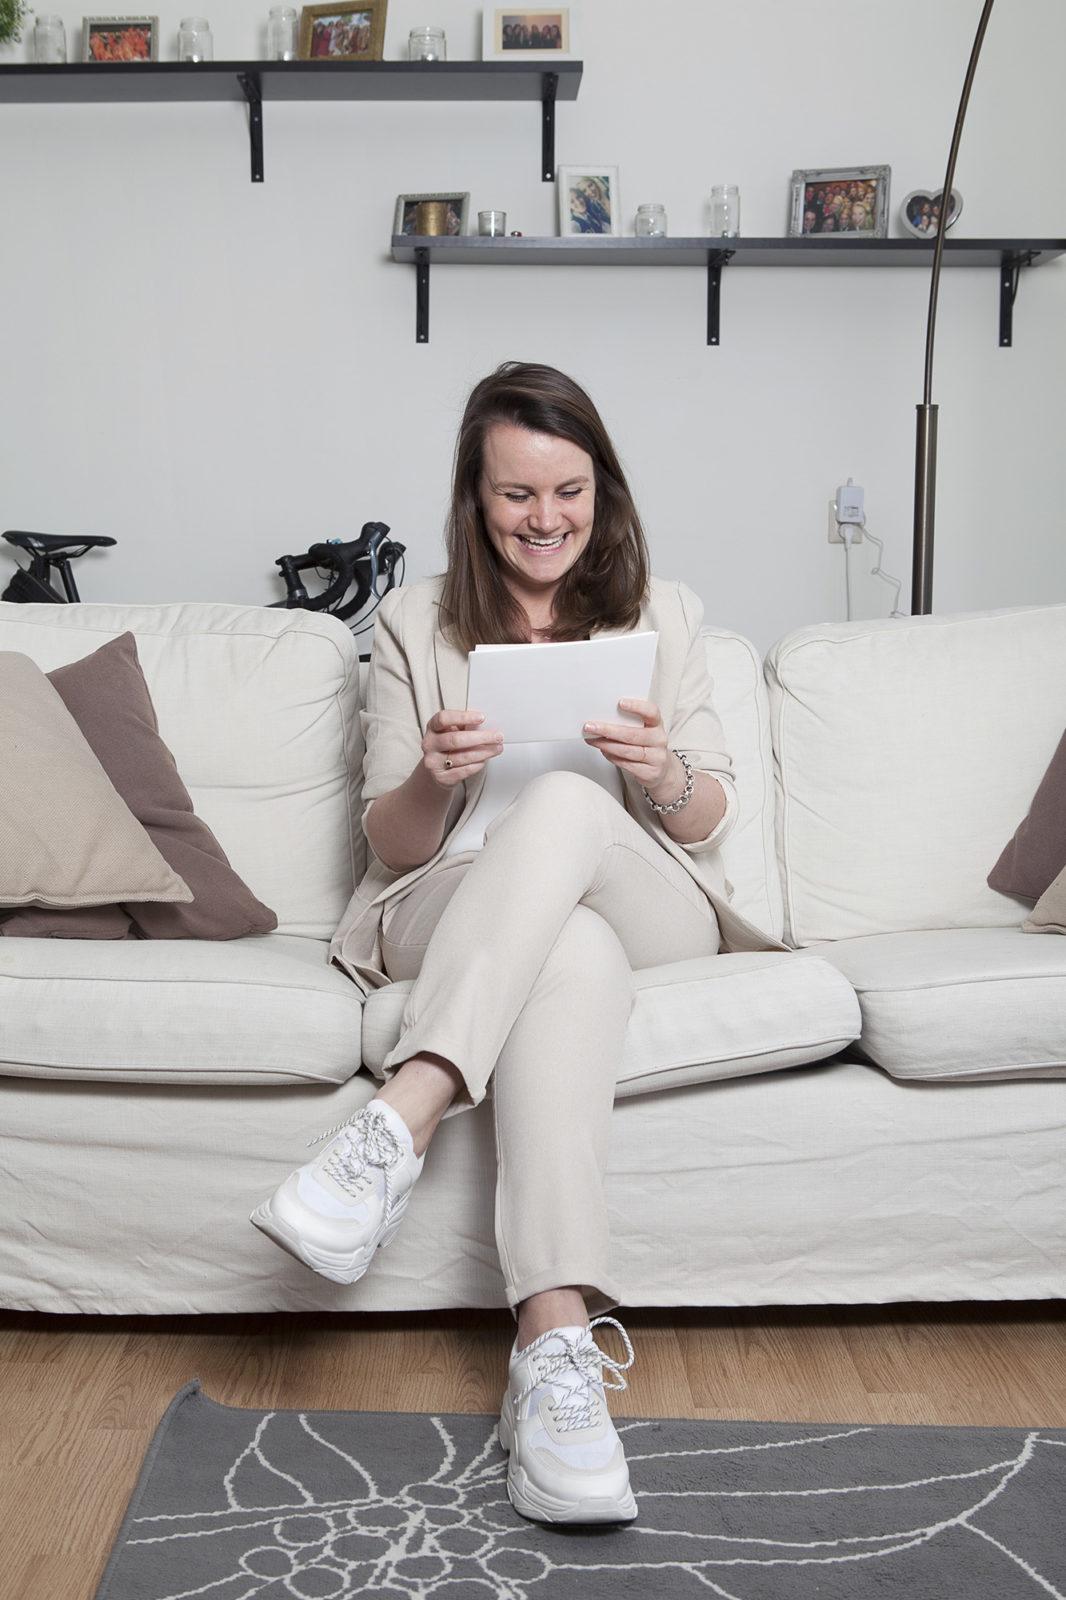 Online lezing 'Maskerclass': Samen maken we depressie bespreekbaar UB (NL)